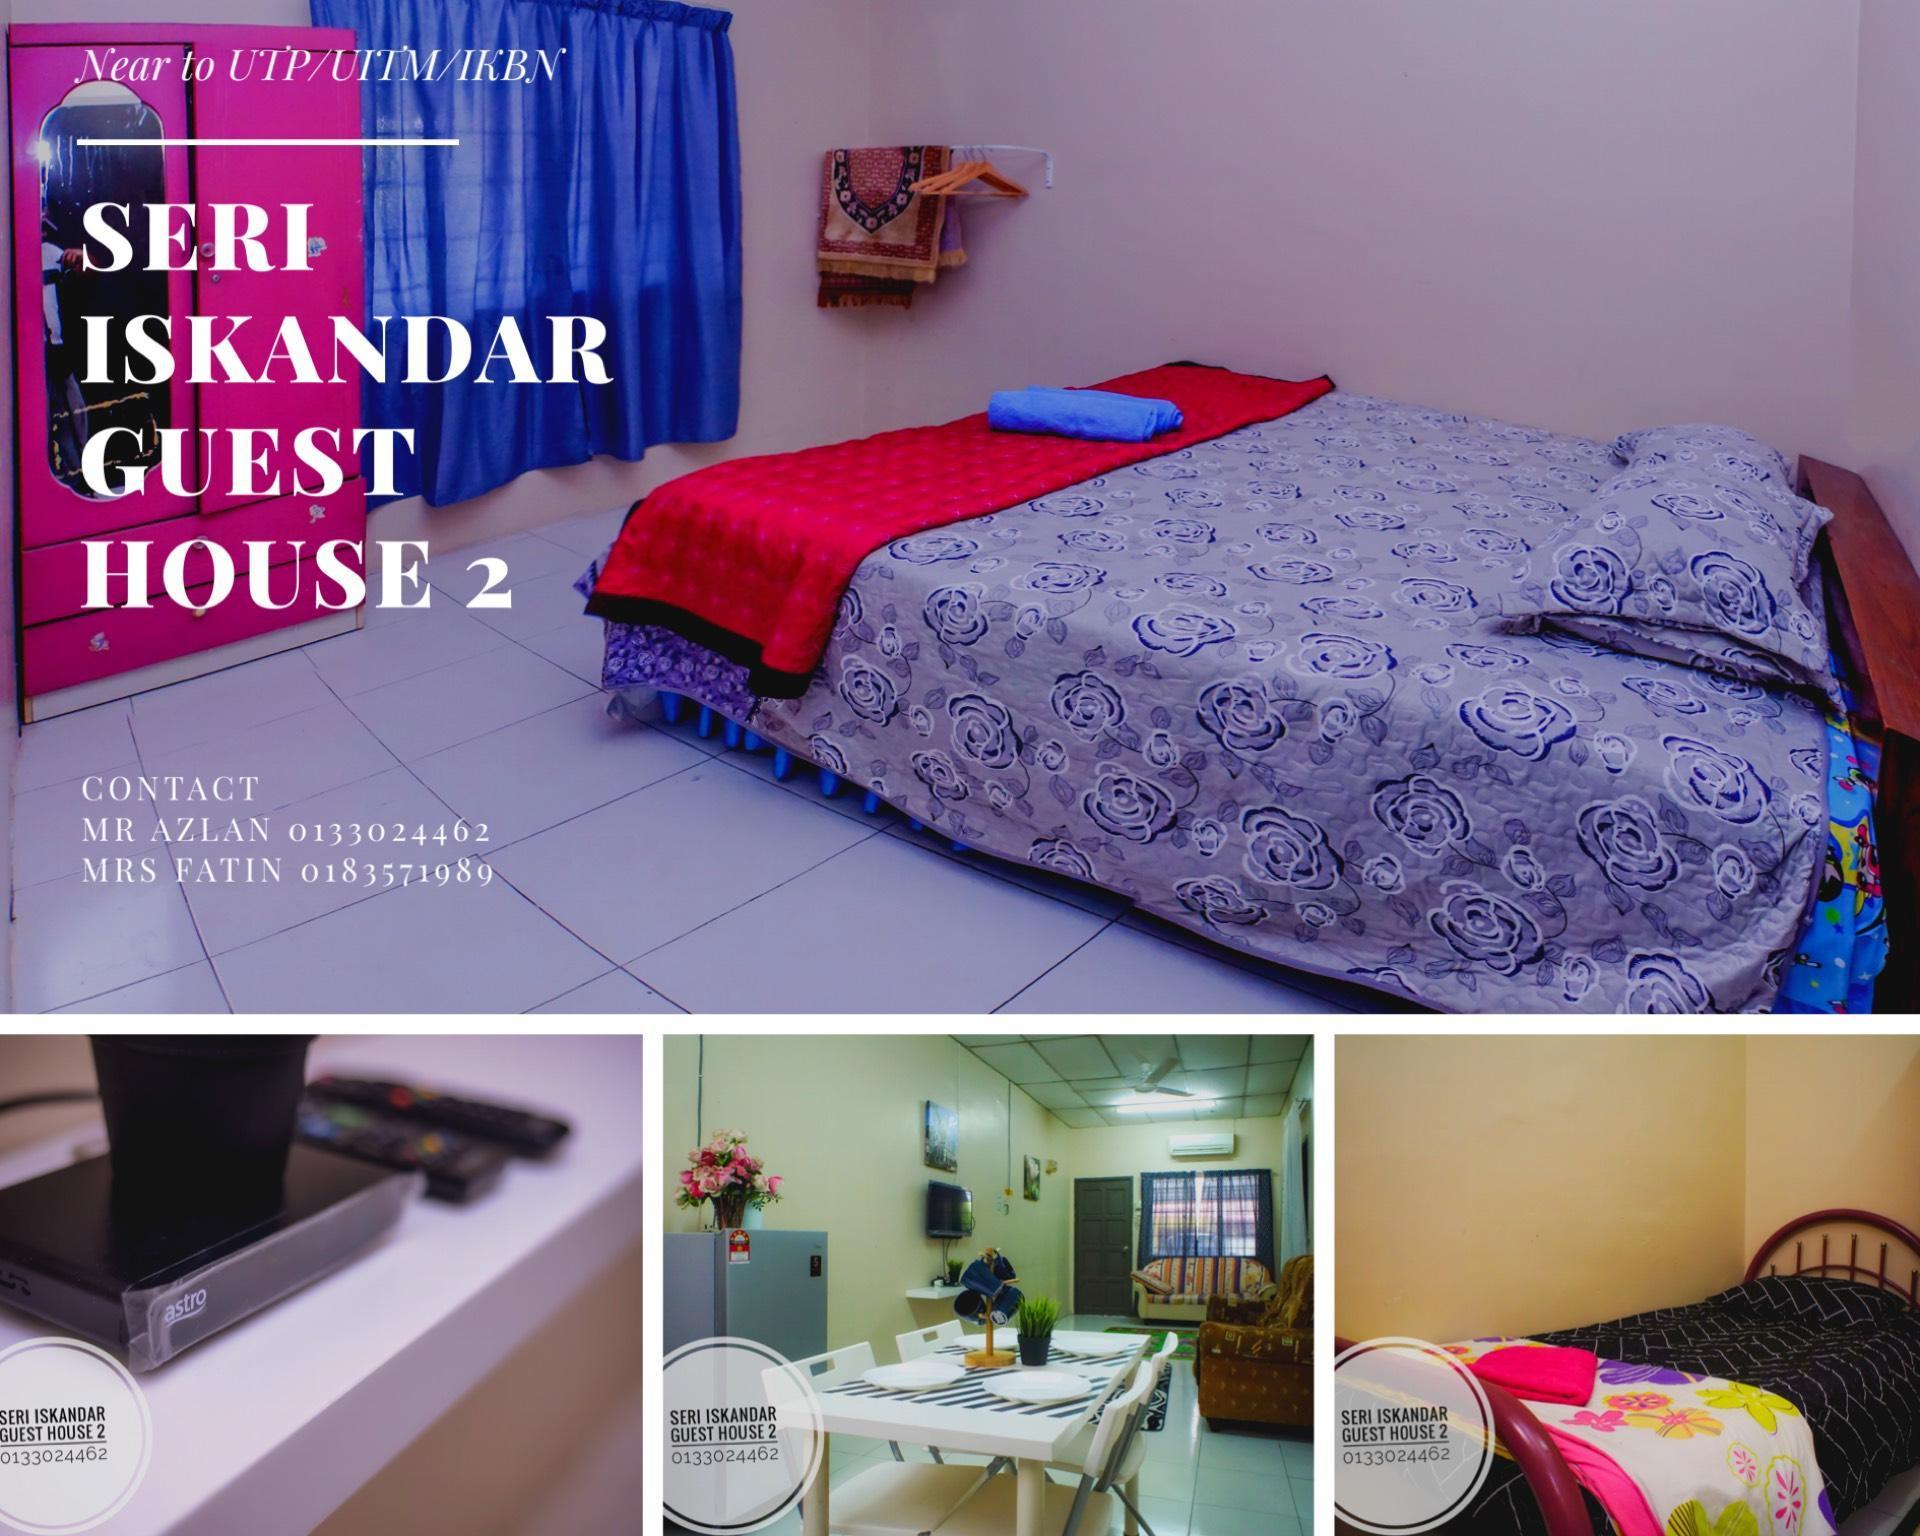 Seri Iskandar Guest House 2 Near UTP UITM Perak